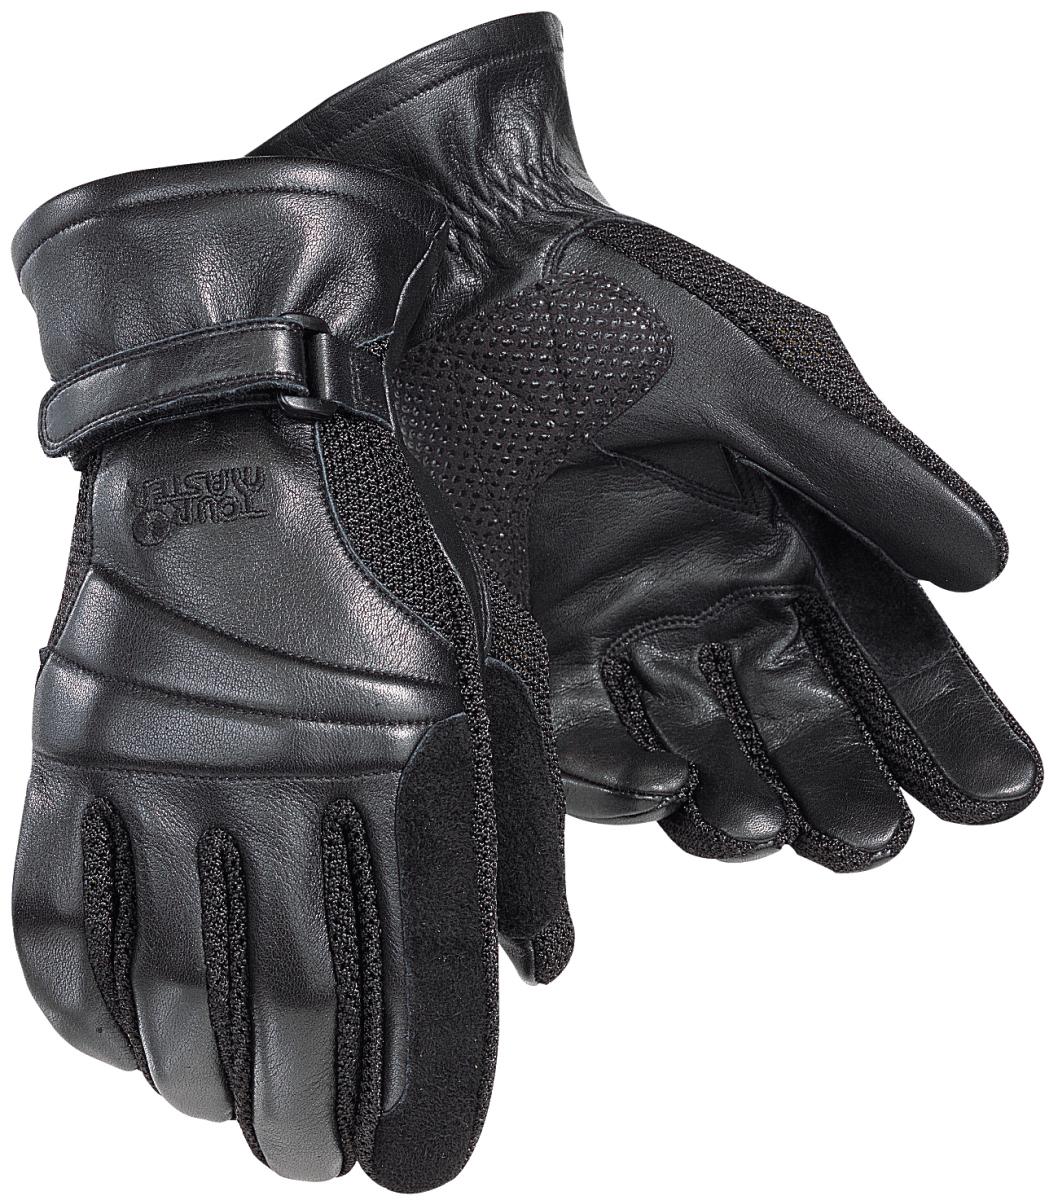 Gel Cruiser 2 Gloves Black